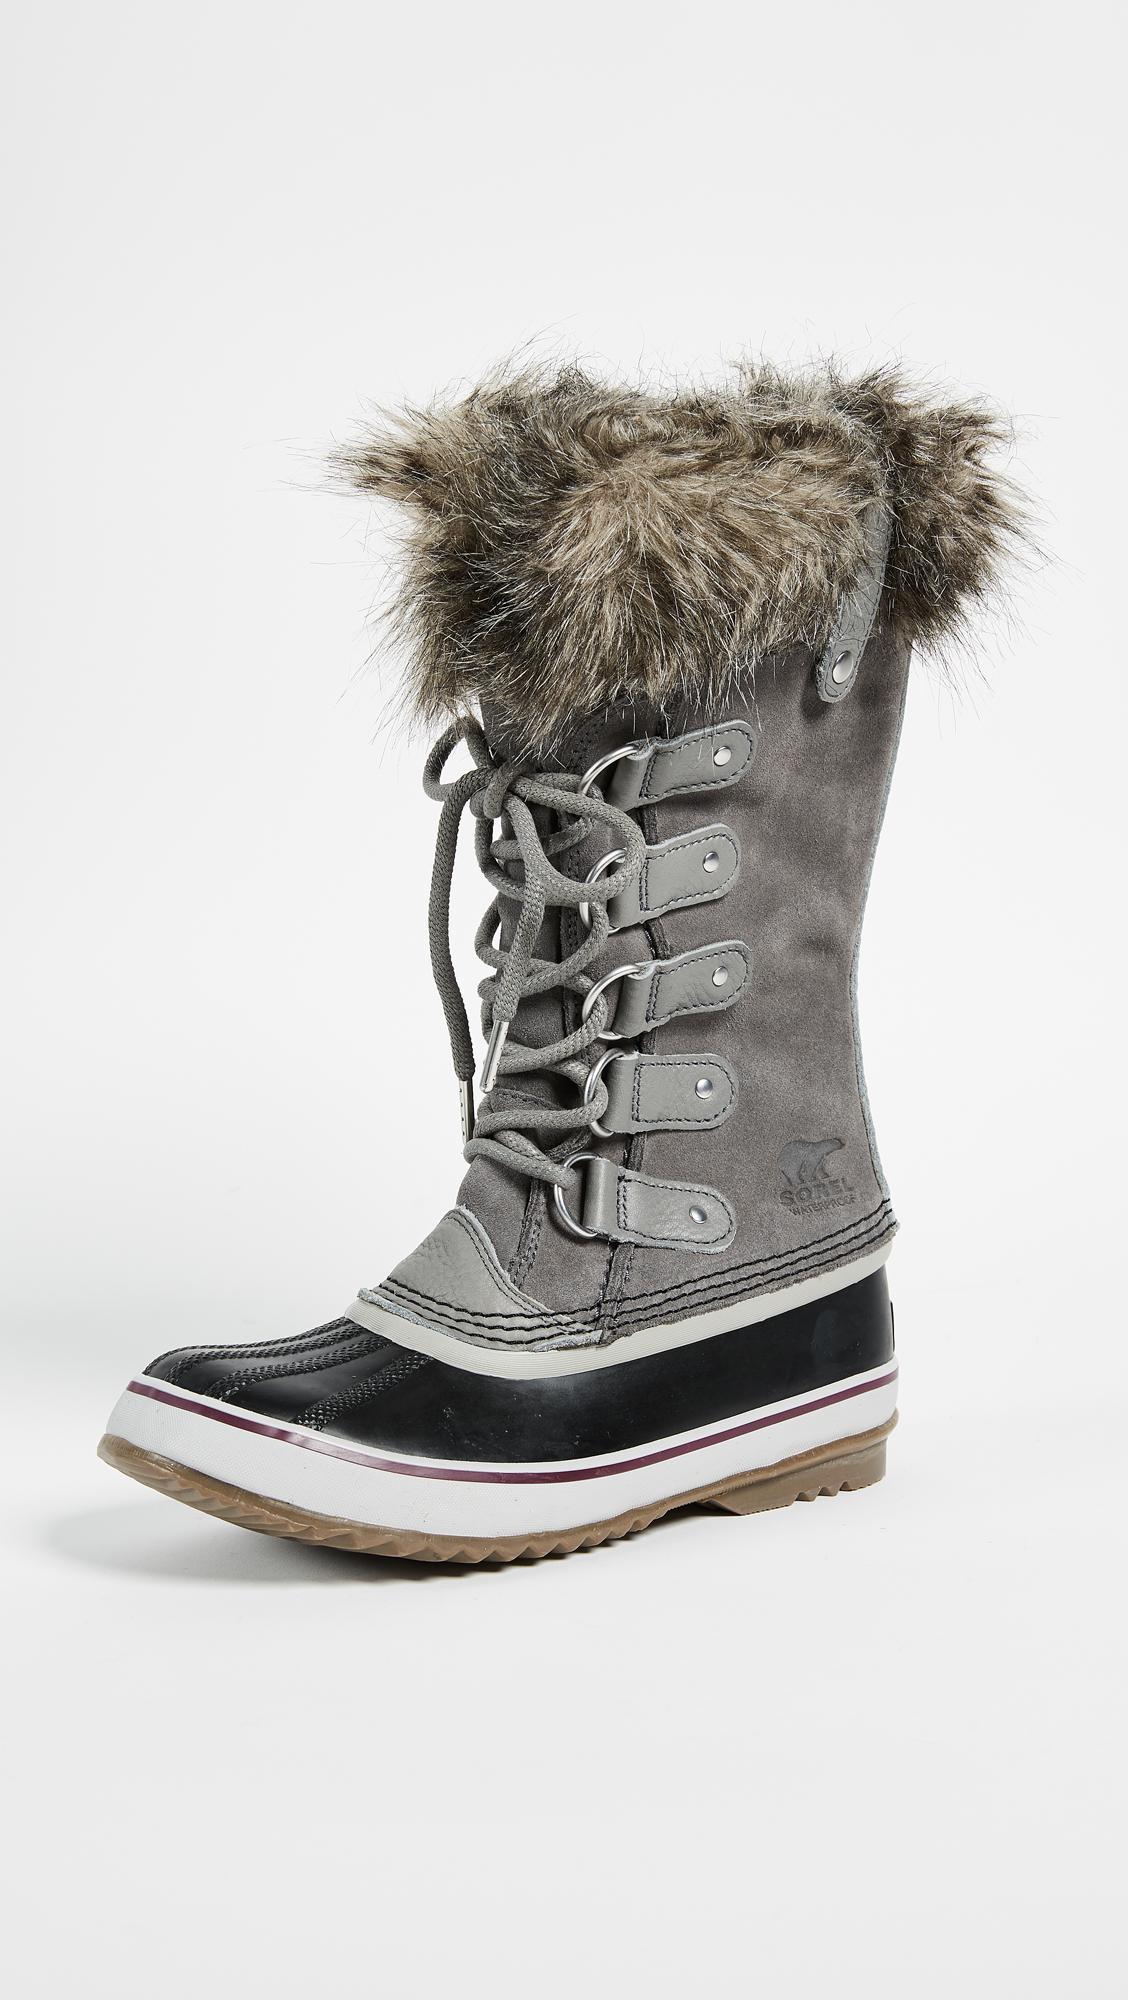 lyst sorel joan of arctic boots save 17. Black Bedroom Furniture Sets. Home Design Ideas